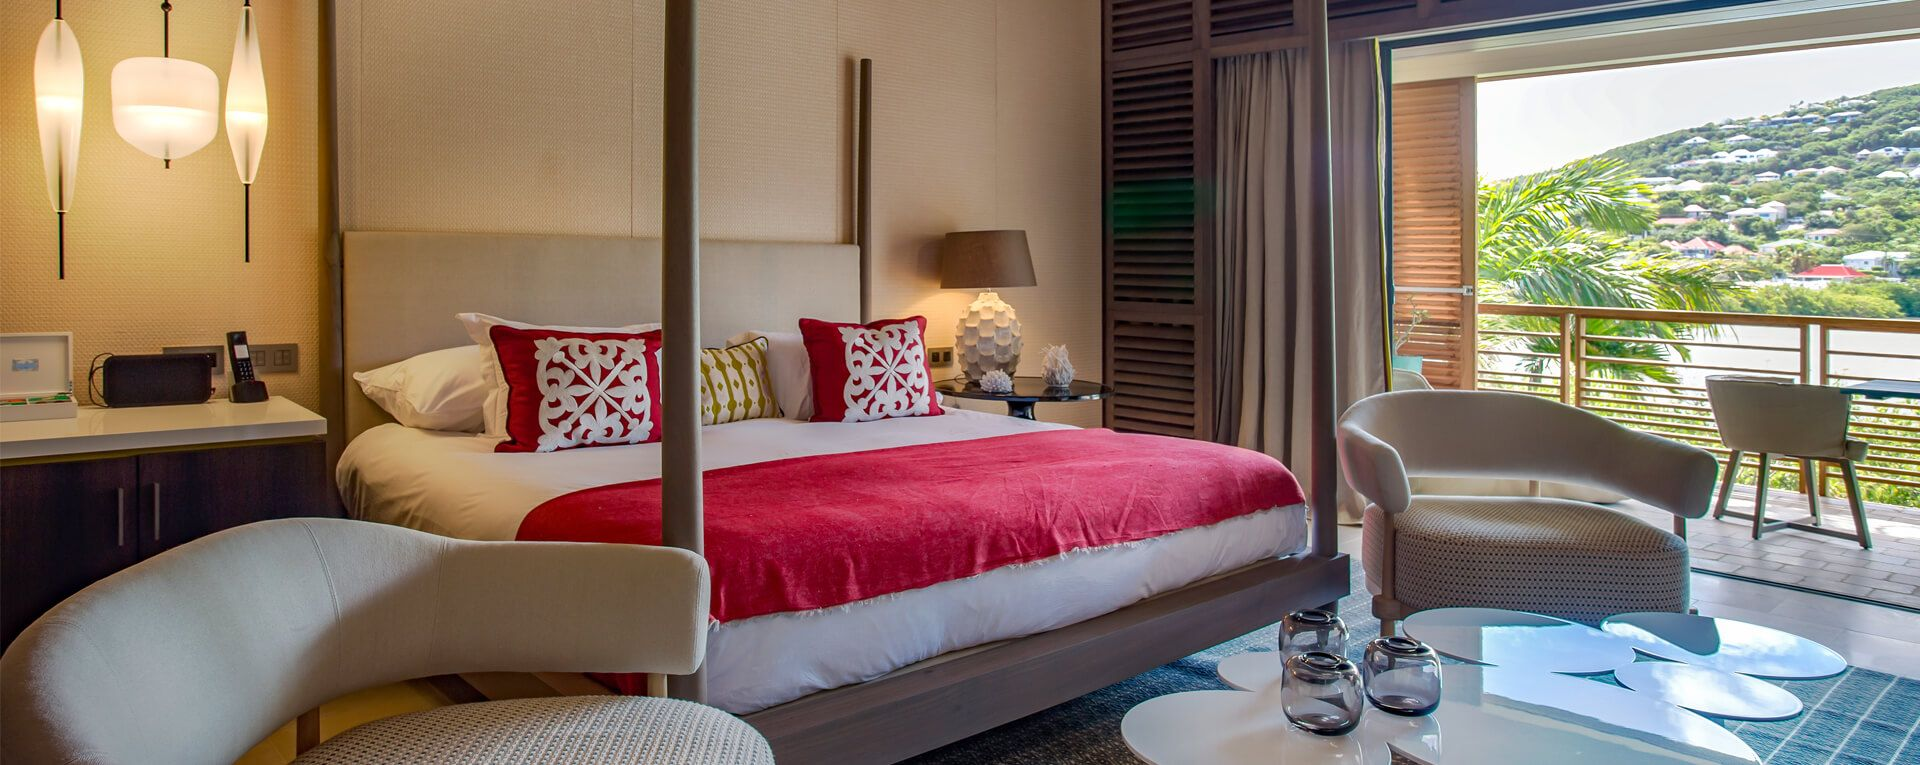 Le Barthelemy Hotel & Spa